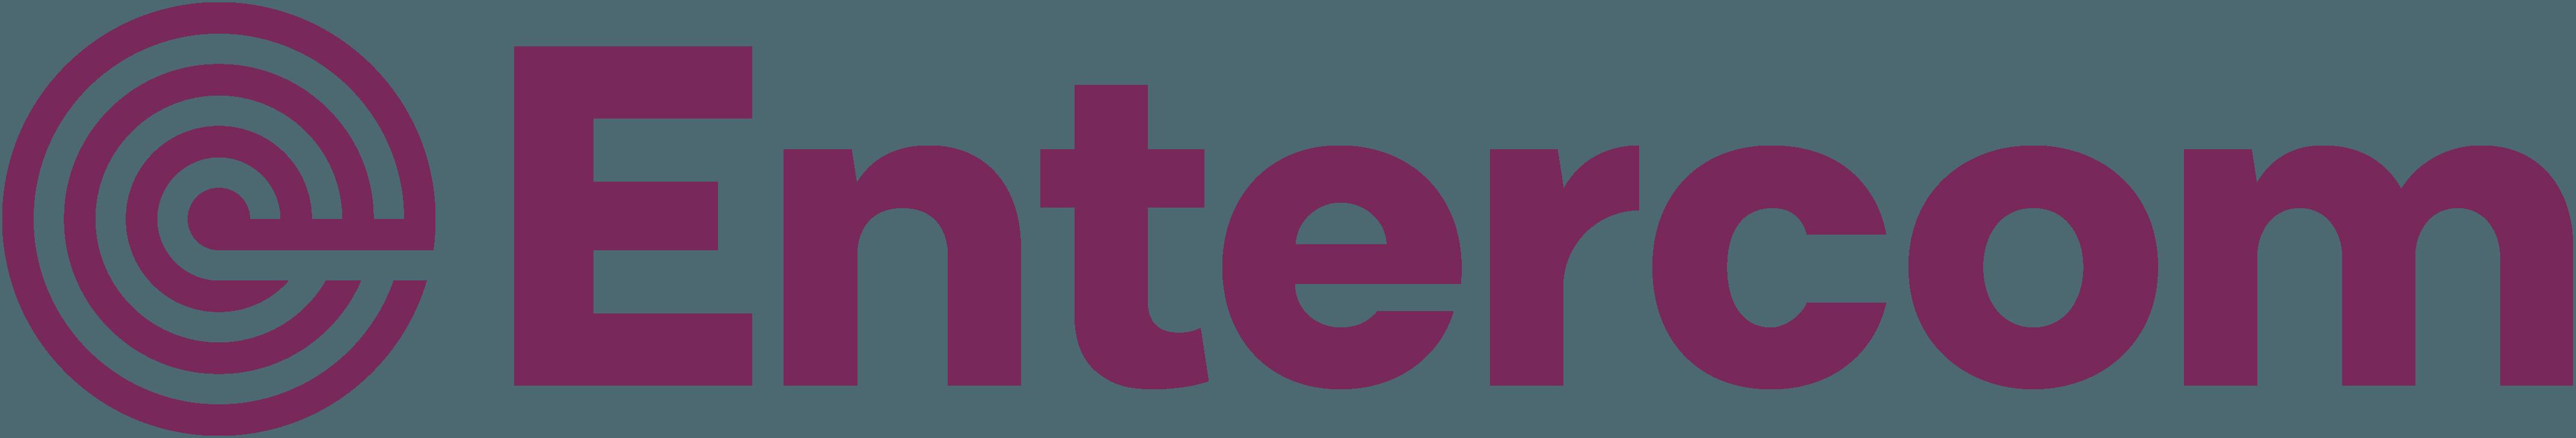 Winning with Audio: Entercom as America's New Media Powerhouse- Logo